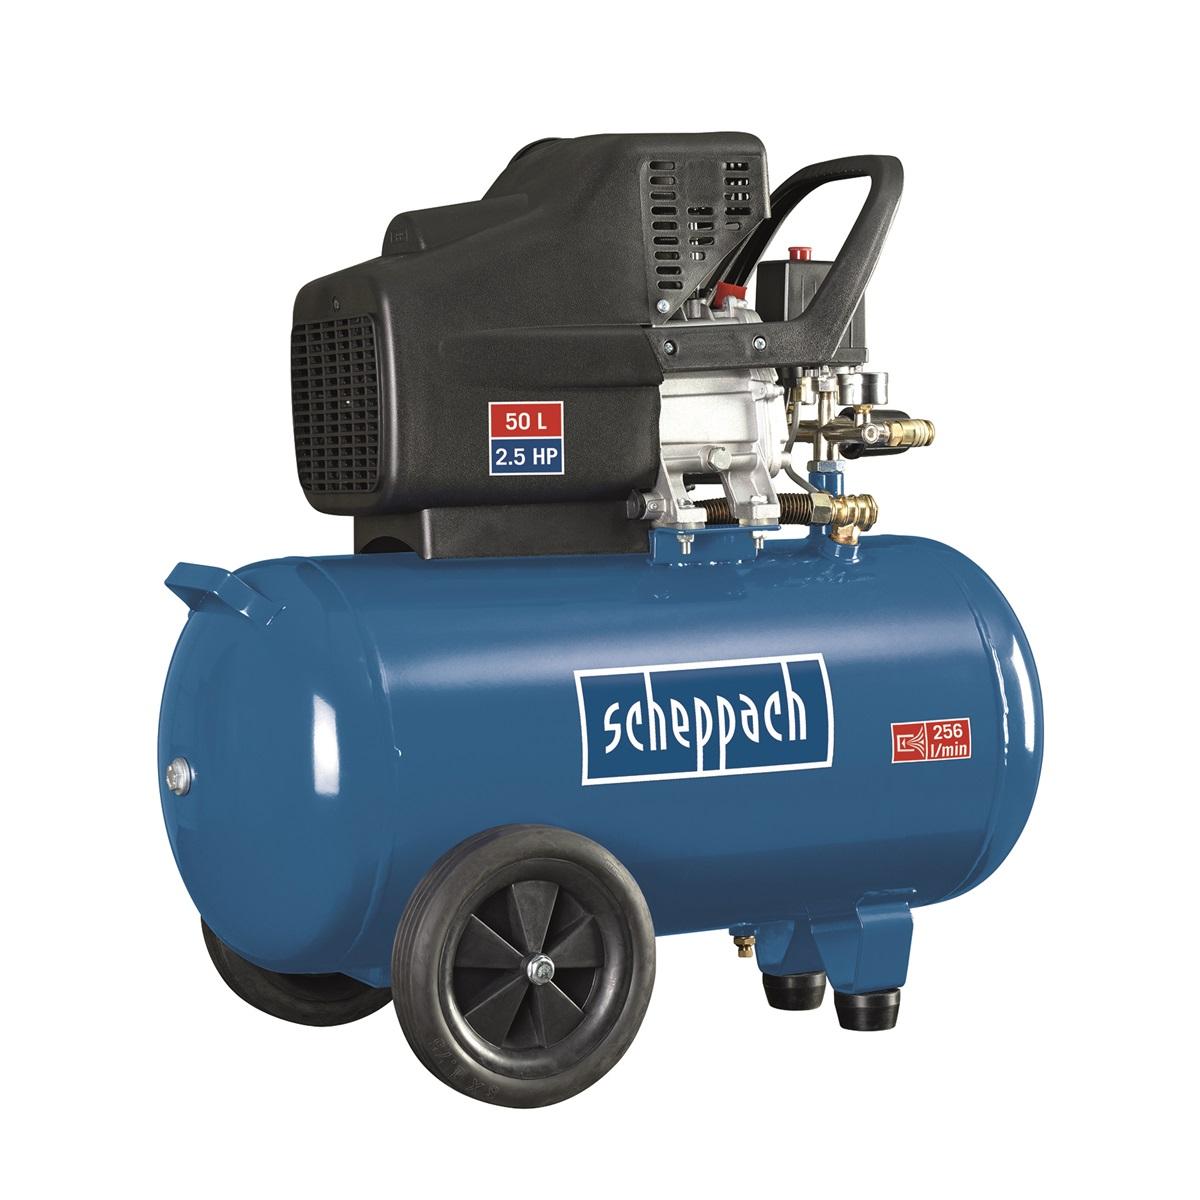 Scheppach HC 51, olejový kompresor 50 l